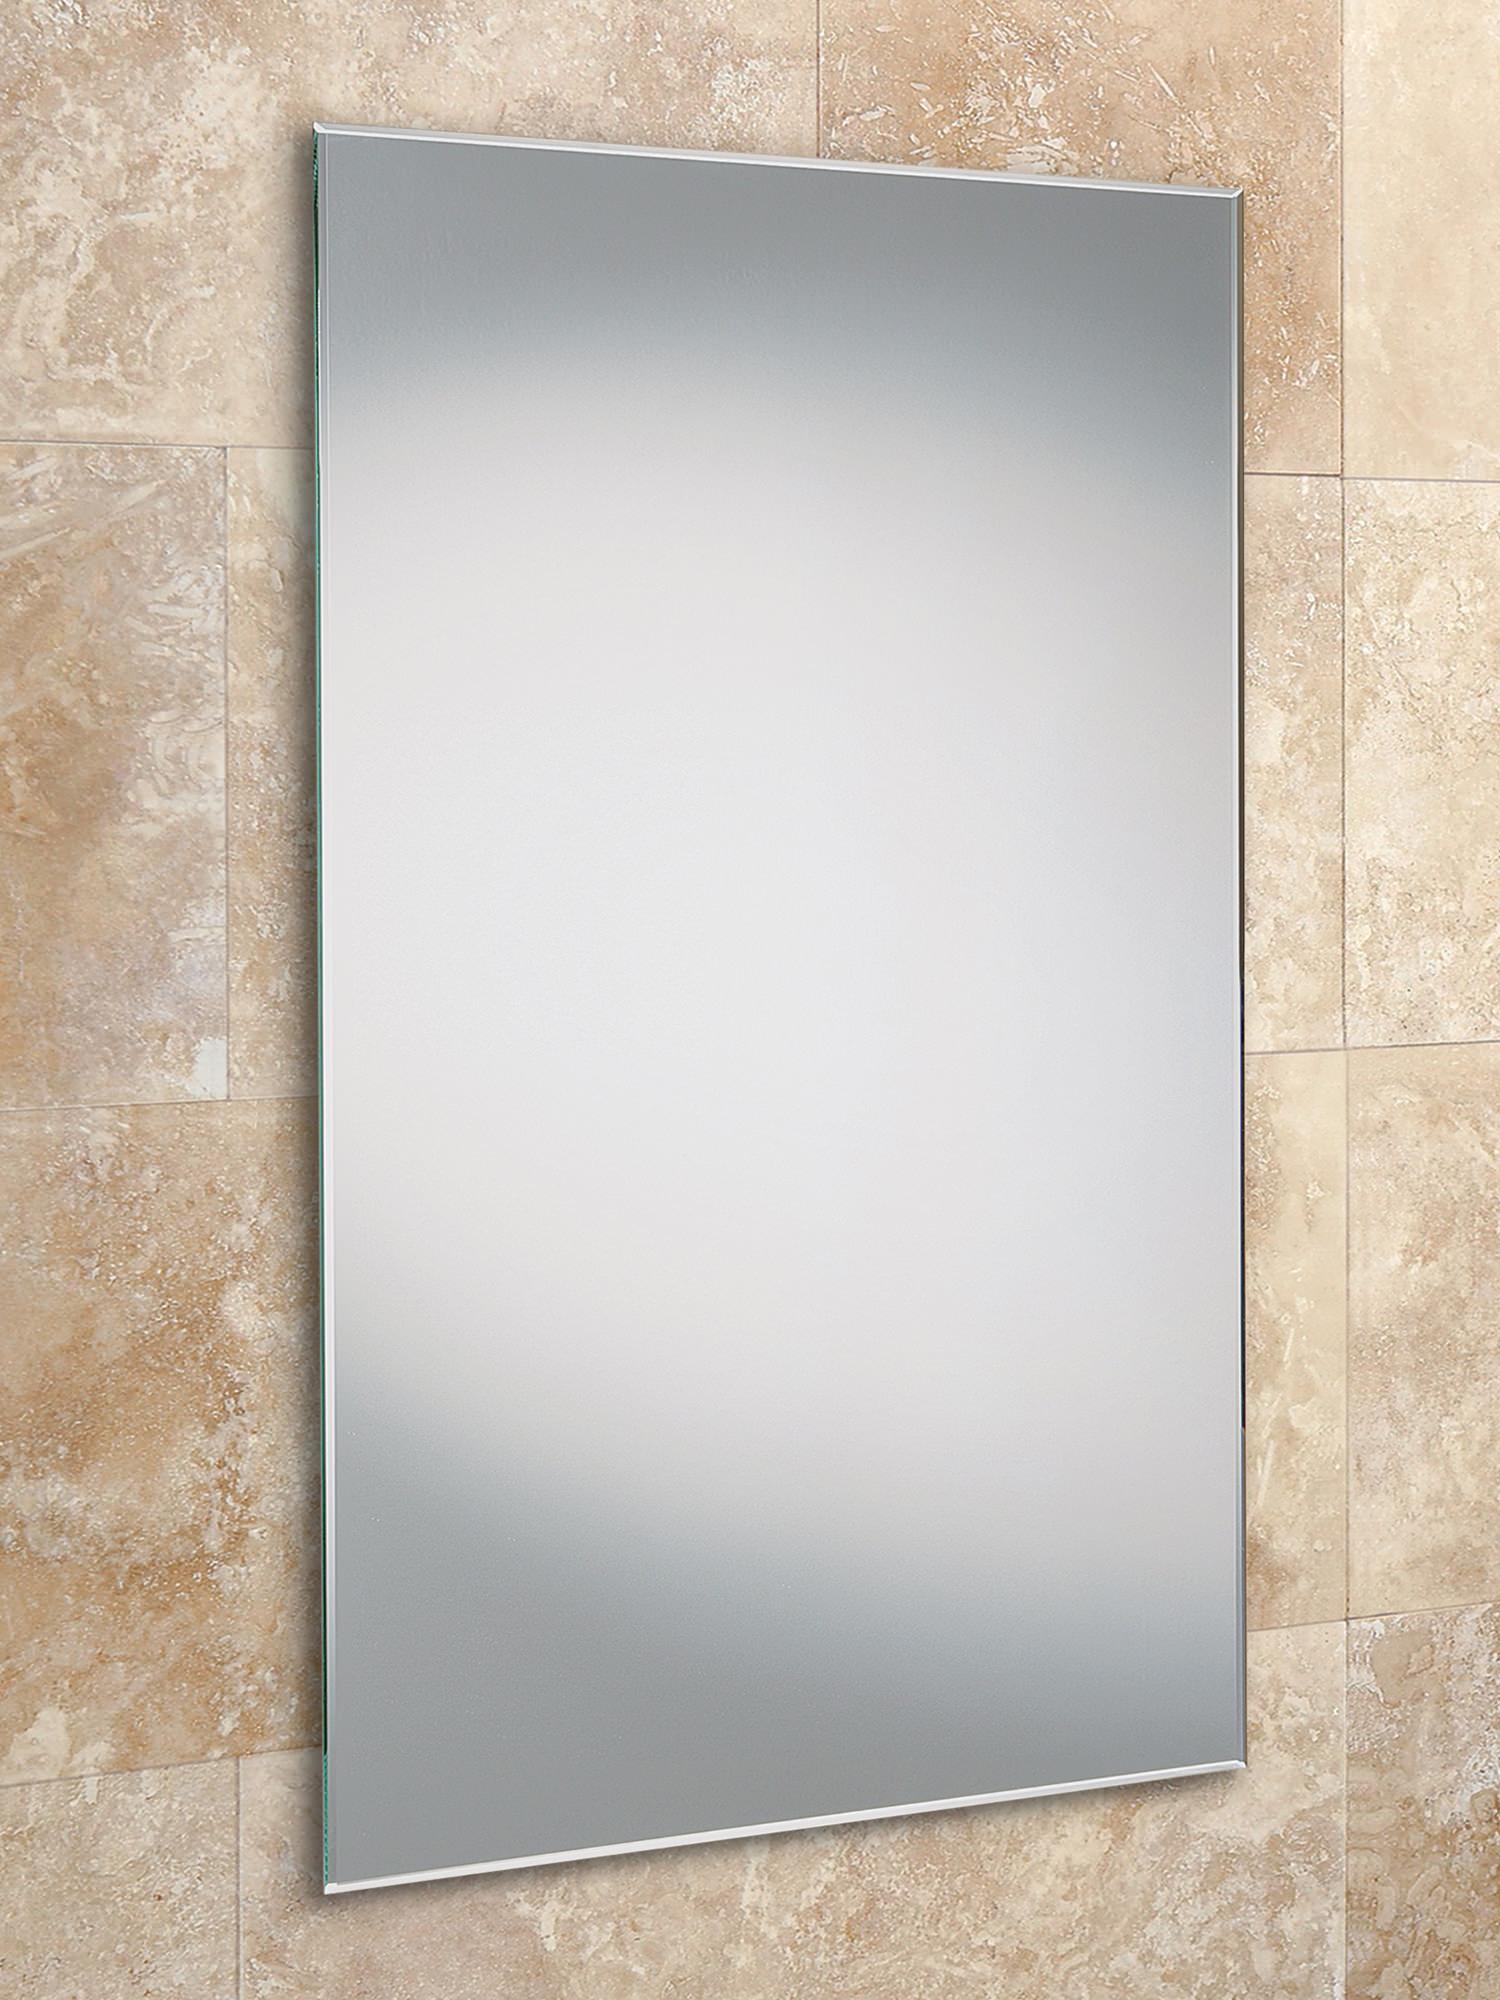 Bevelled Bathroom Mirror Hib Fili Slimline Mirror With Bevelled Edges 400x800mm 76030000